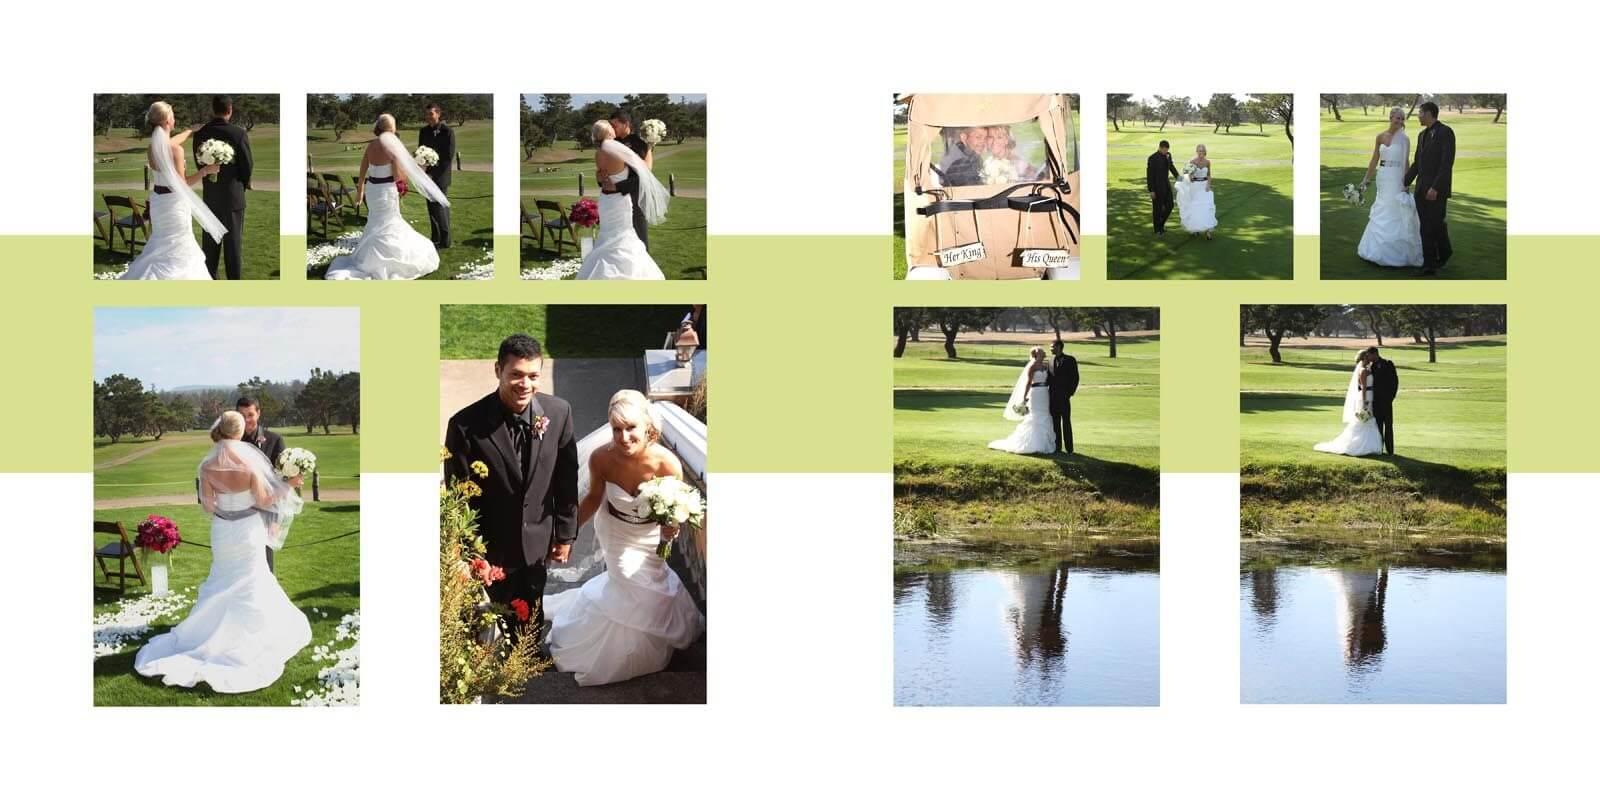 gearheart-cannon-beach-mcmenamins-oregon-coast-wedding-004-005.jpg